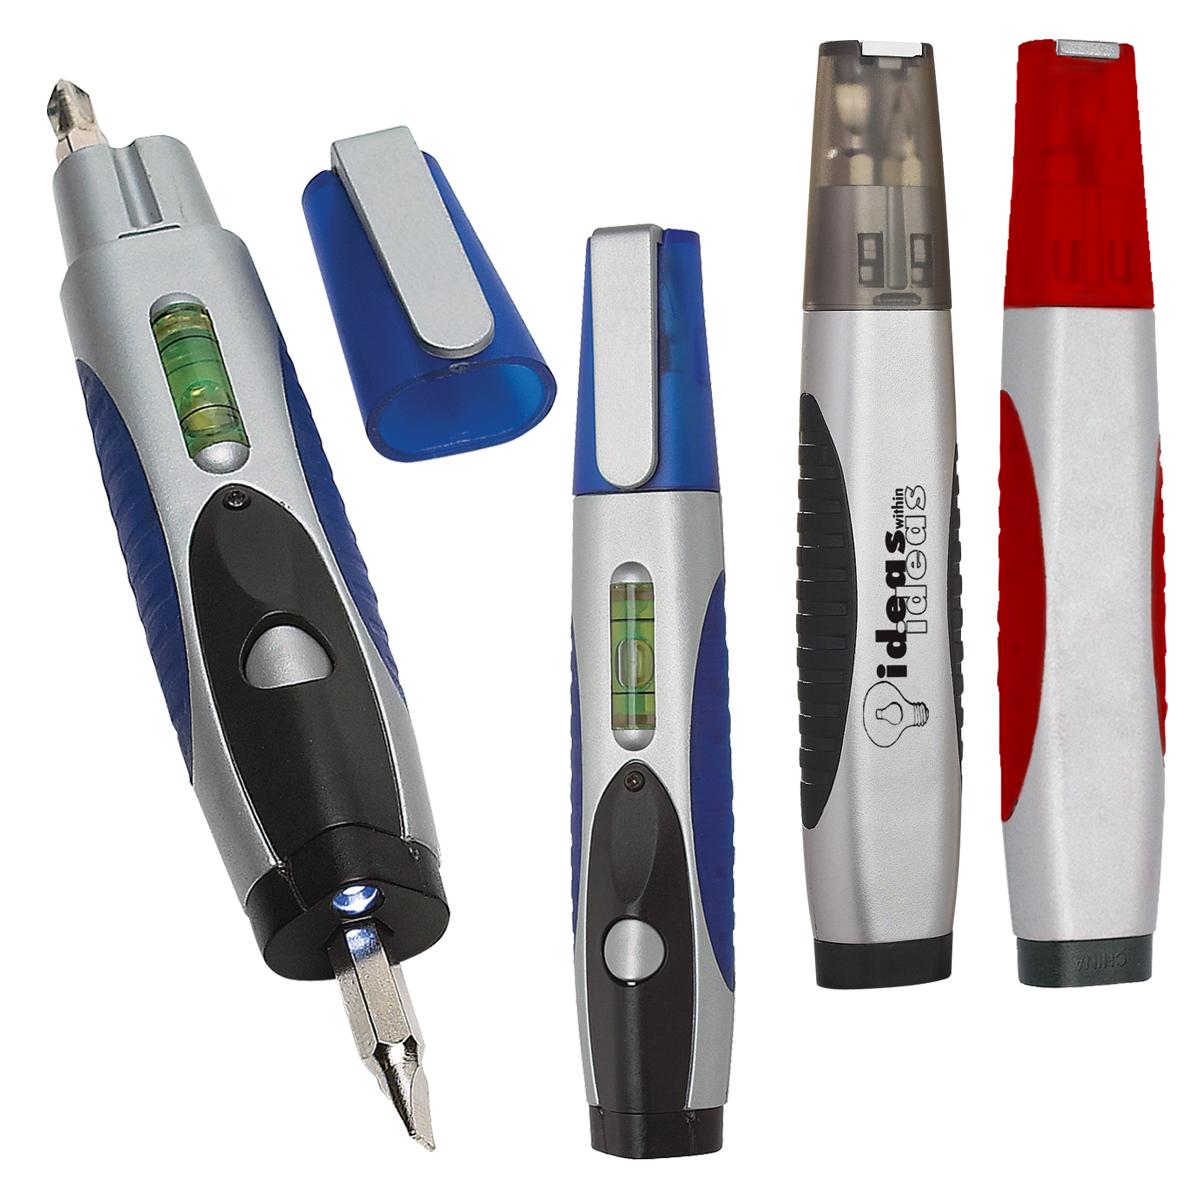 #CM 7223 Multi-Purpose Tool/Flashlight